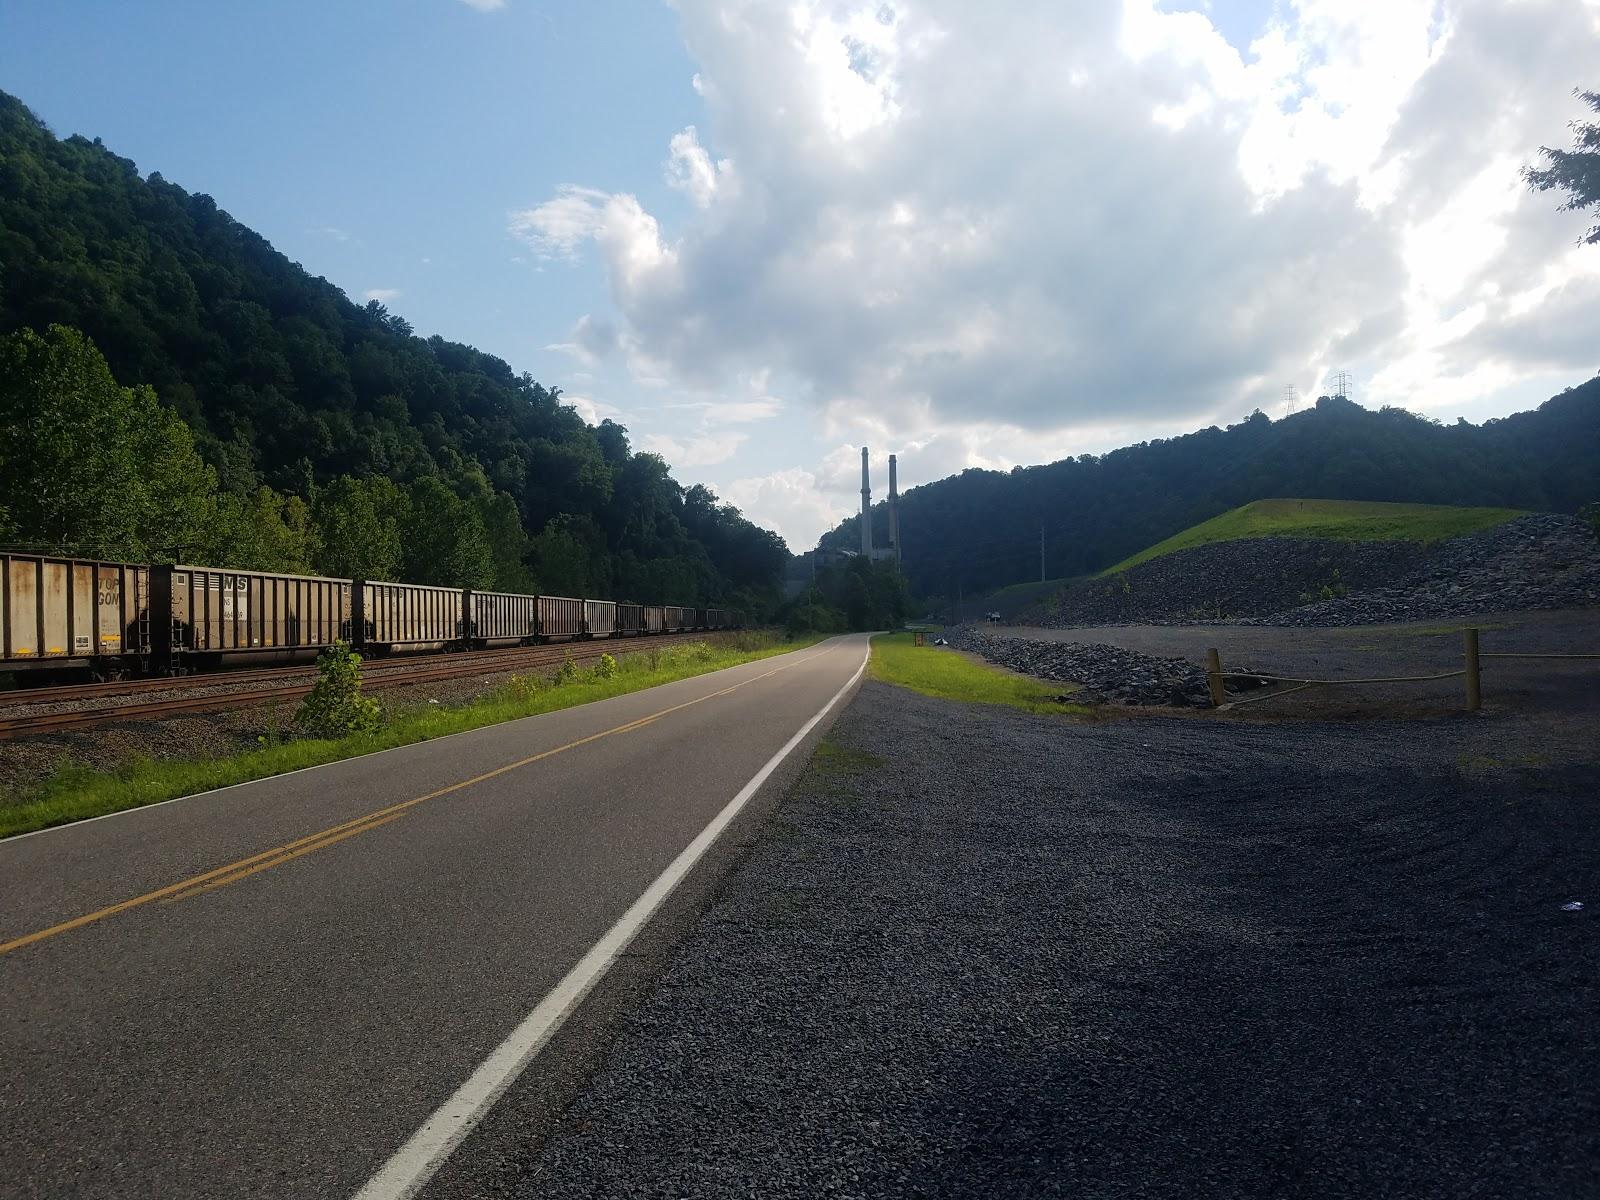 Empty train cars along a mountain road